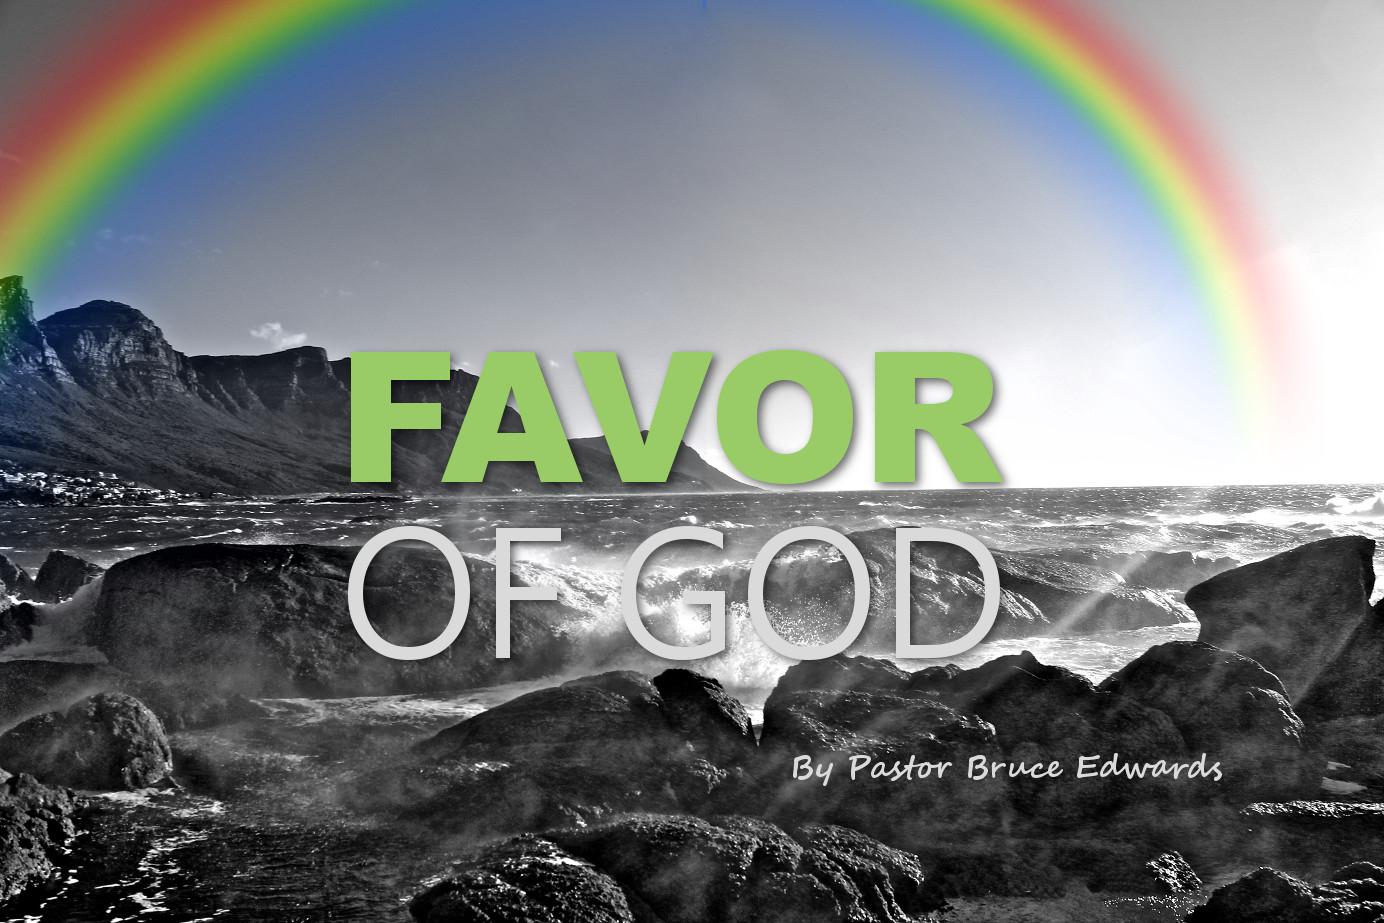 God's favor - use these 5 keys to receive God's favor